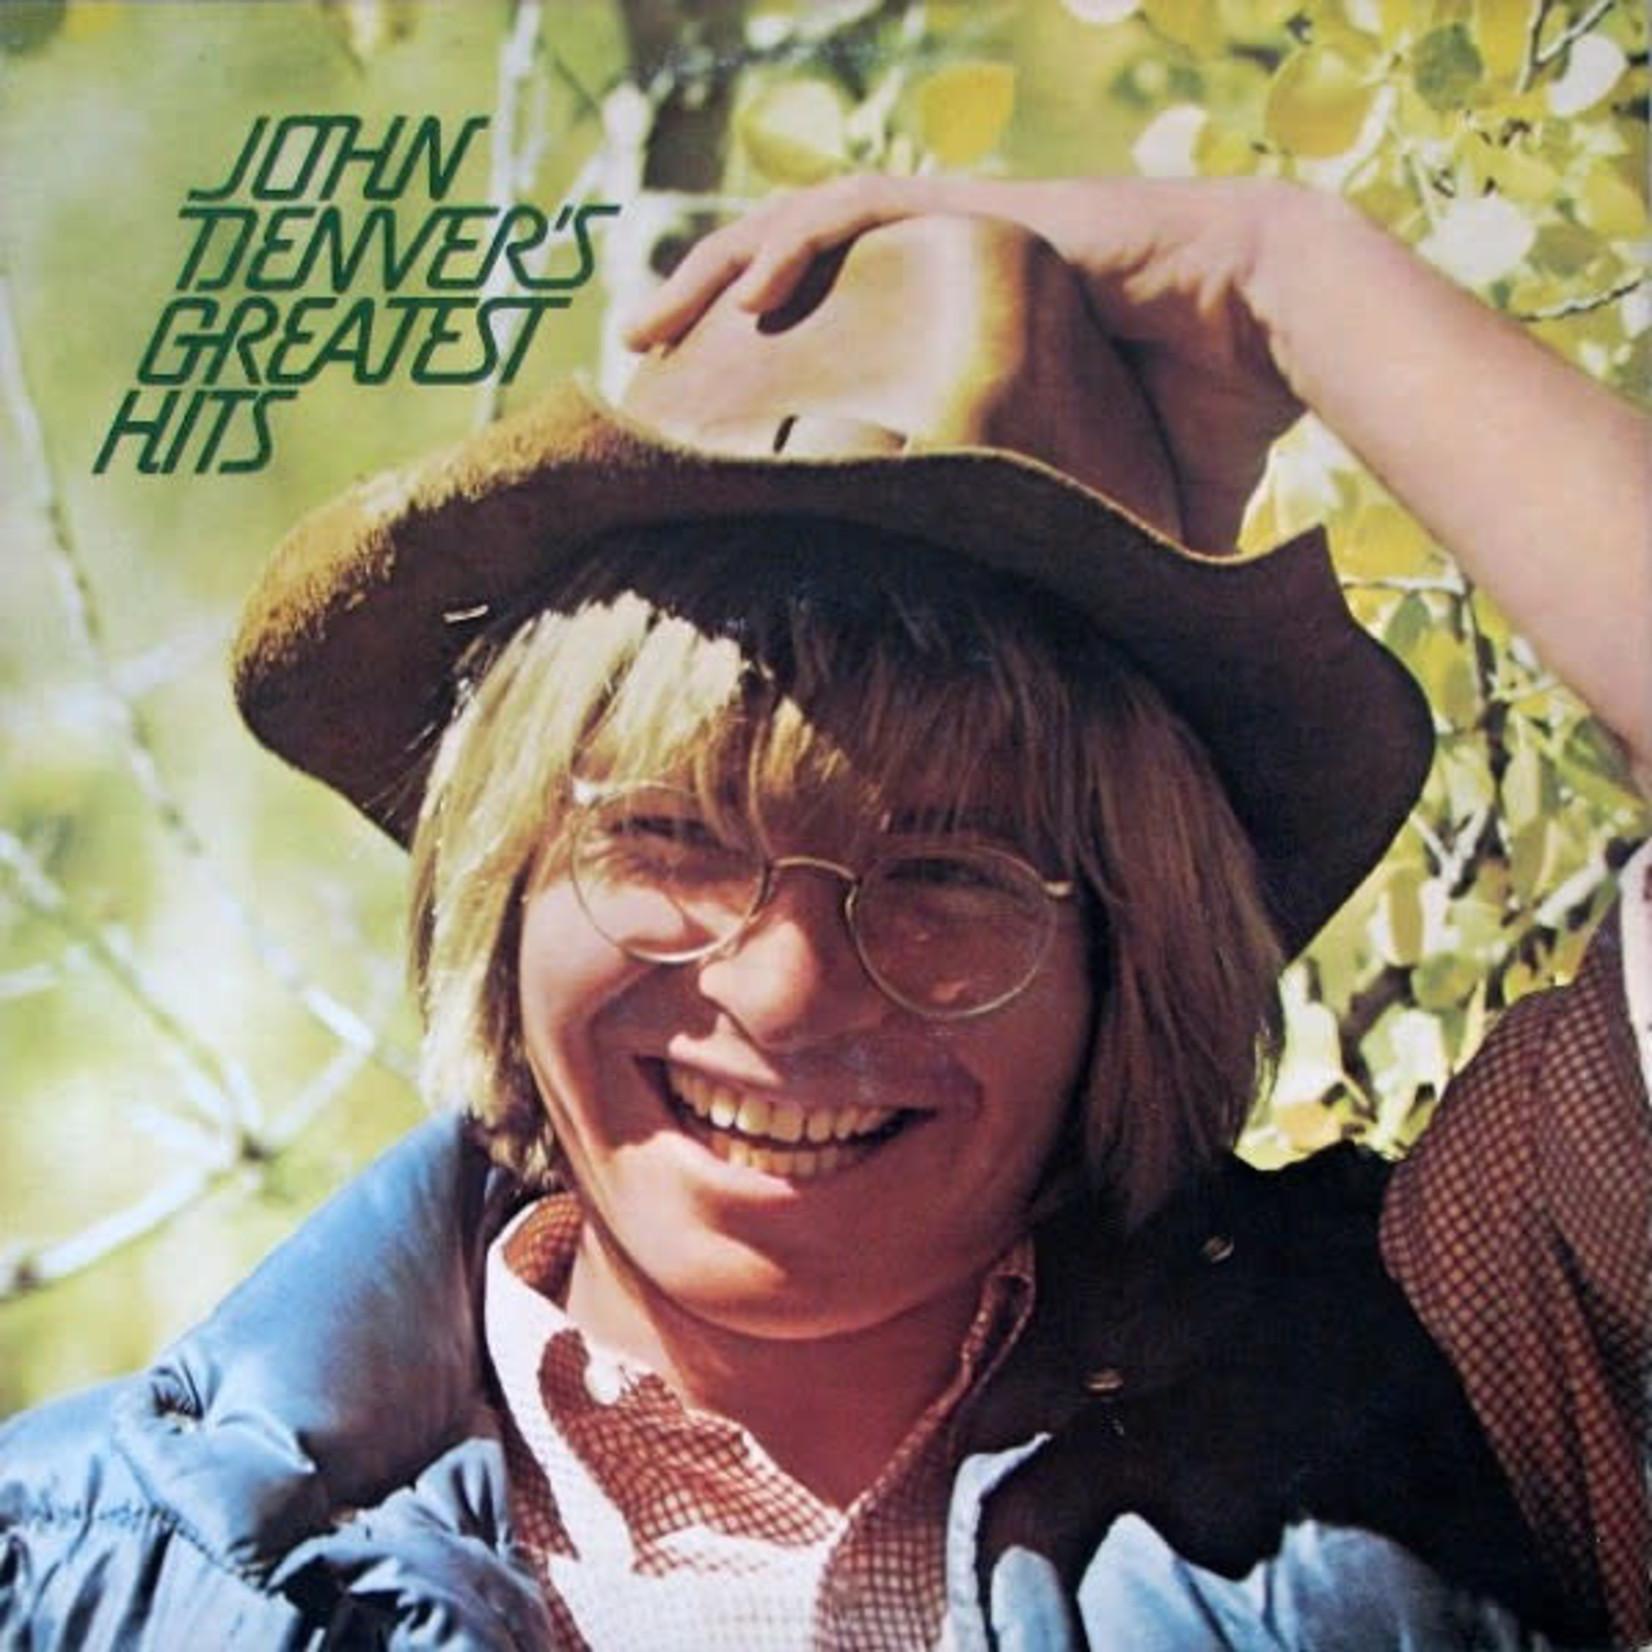 [Vintage] Denver, John: Greatest Hits